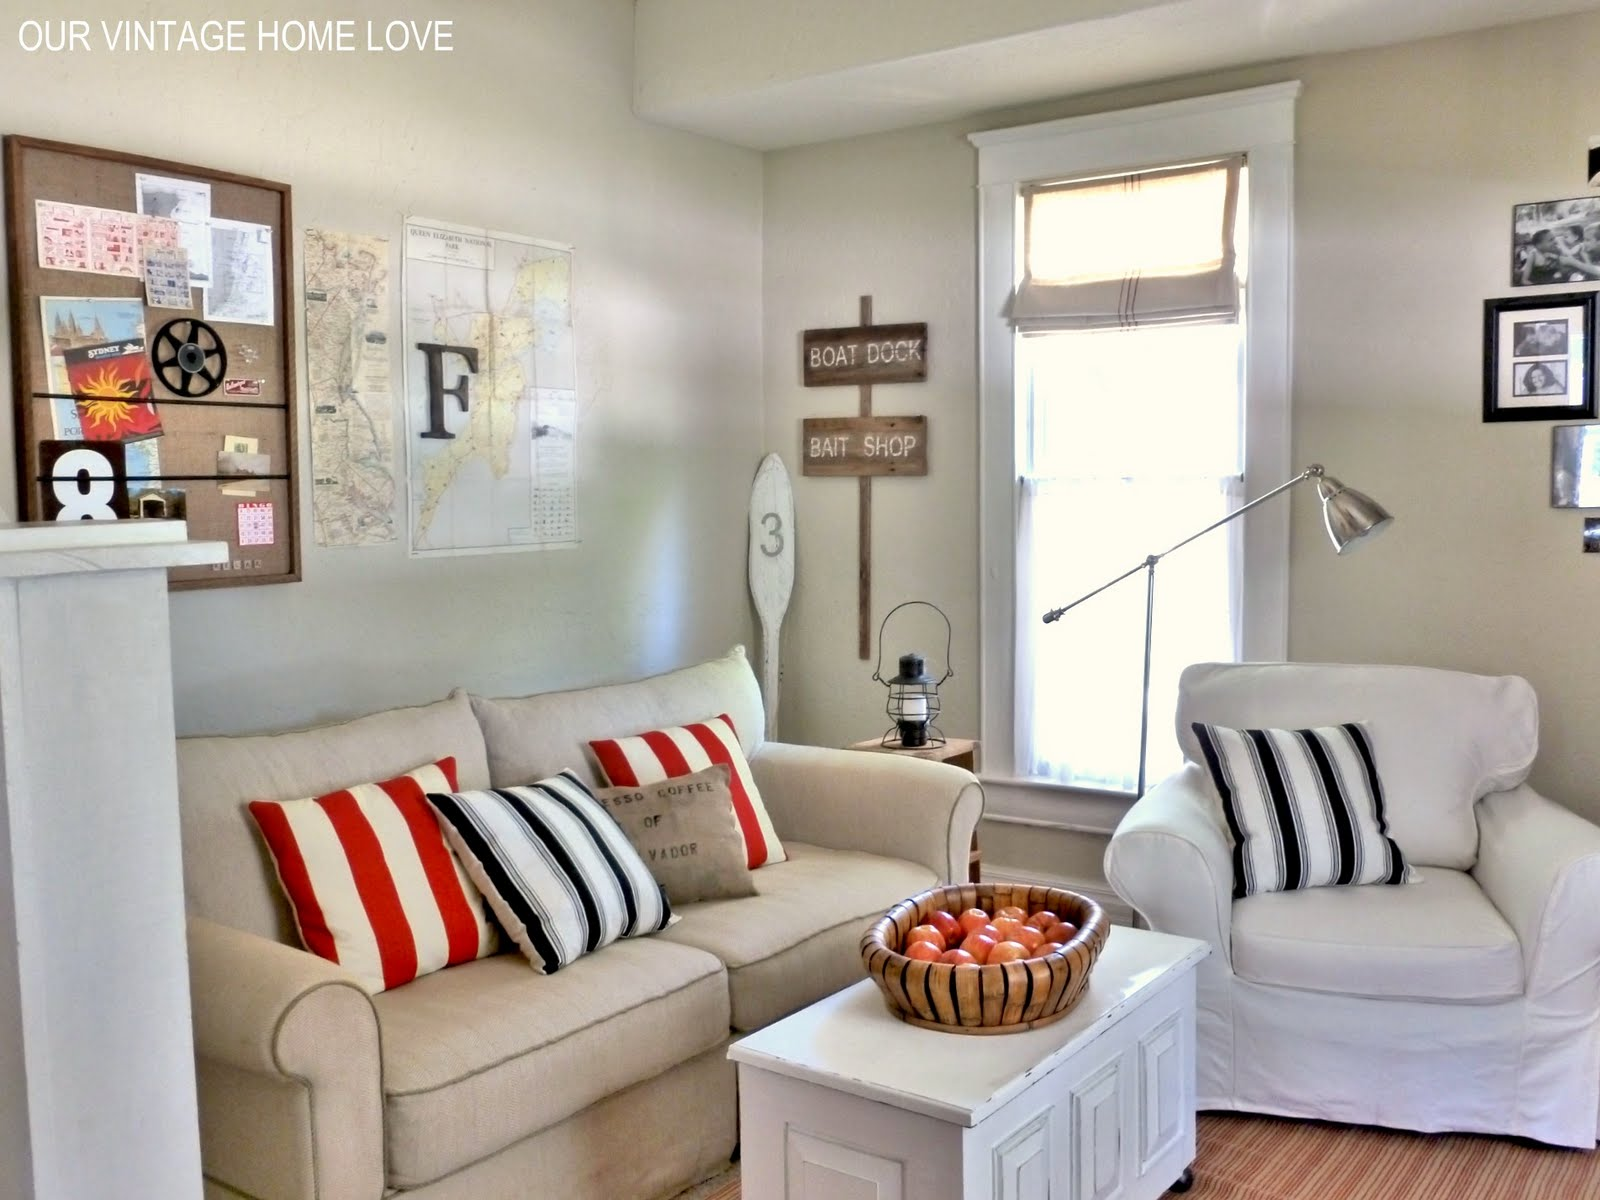 Fine Our Vintage Home Love Family Room Den Ideas Largest Home Design Picture Inspirations Pitcheantrous